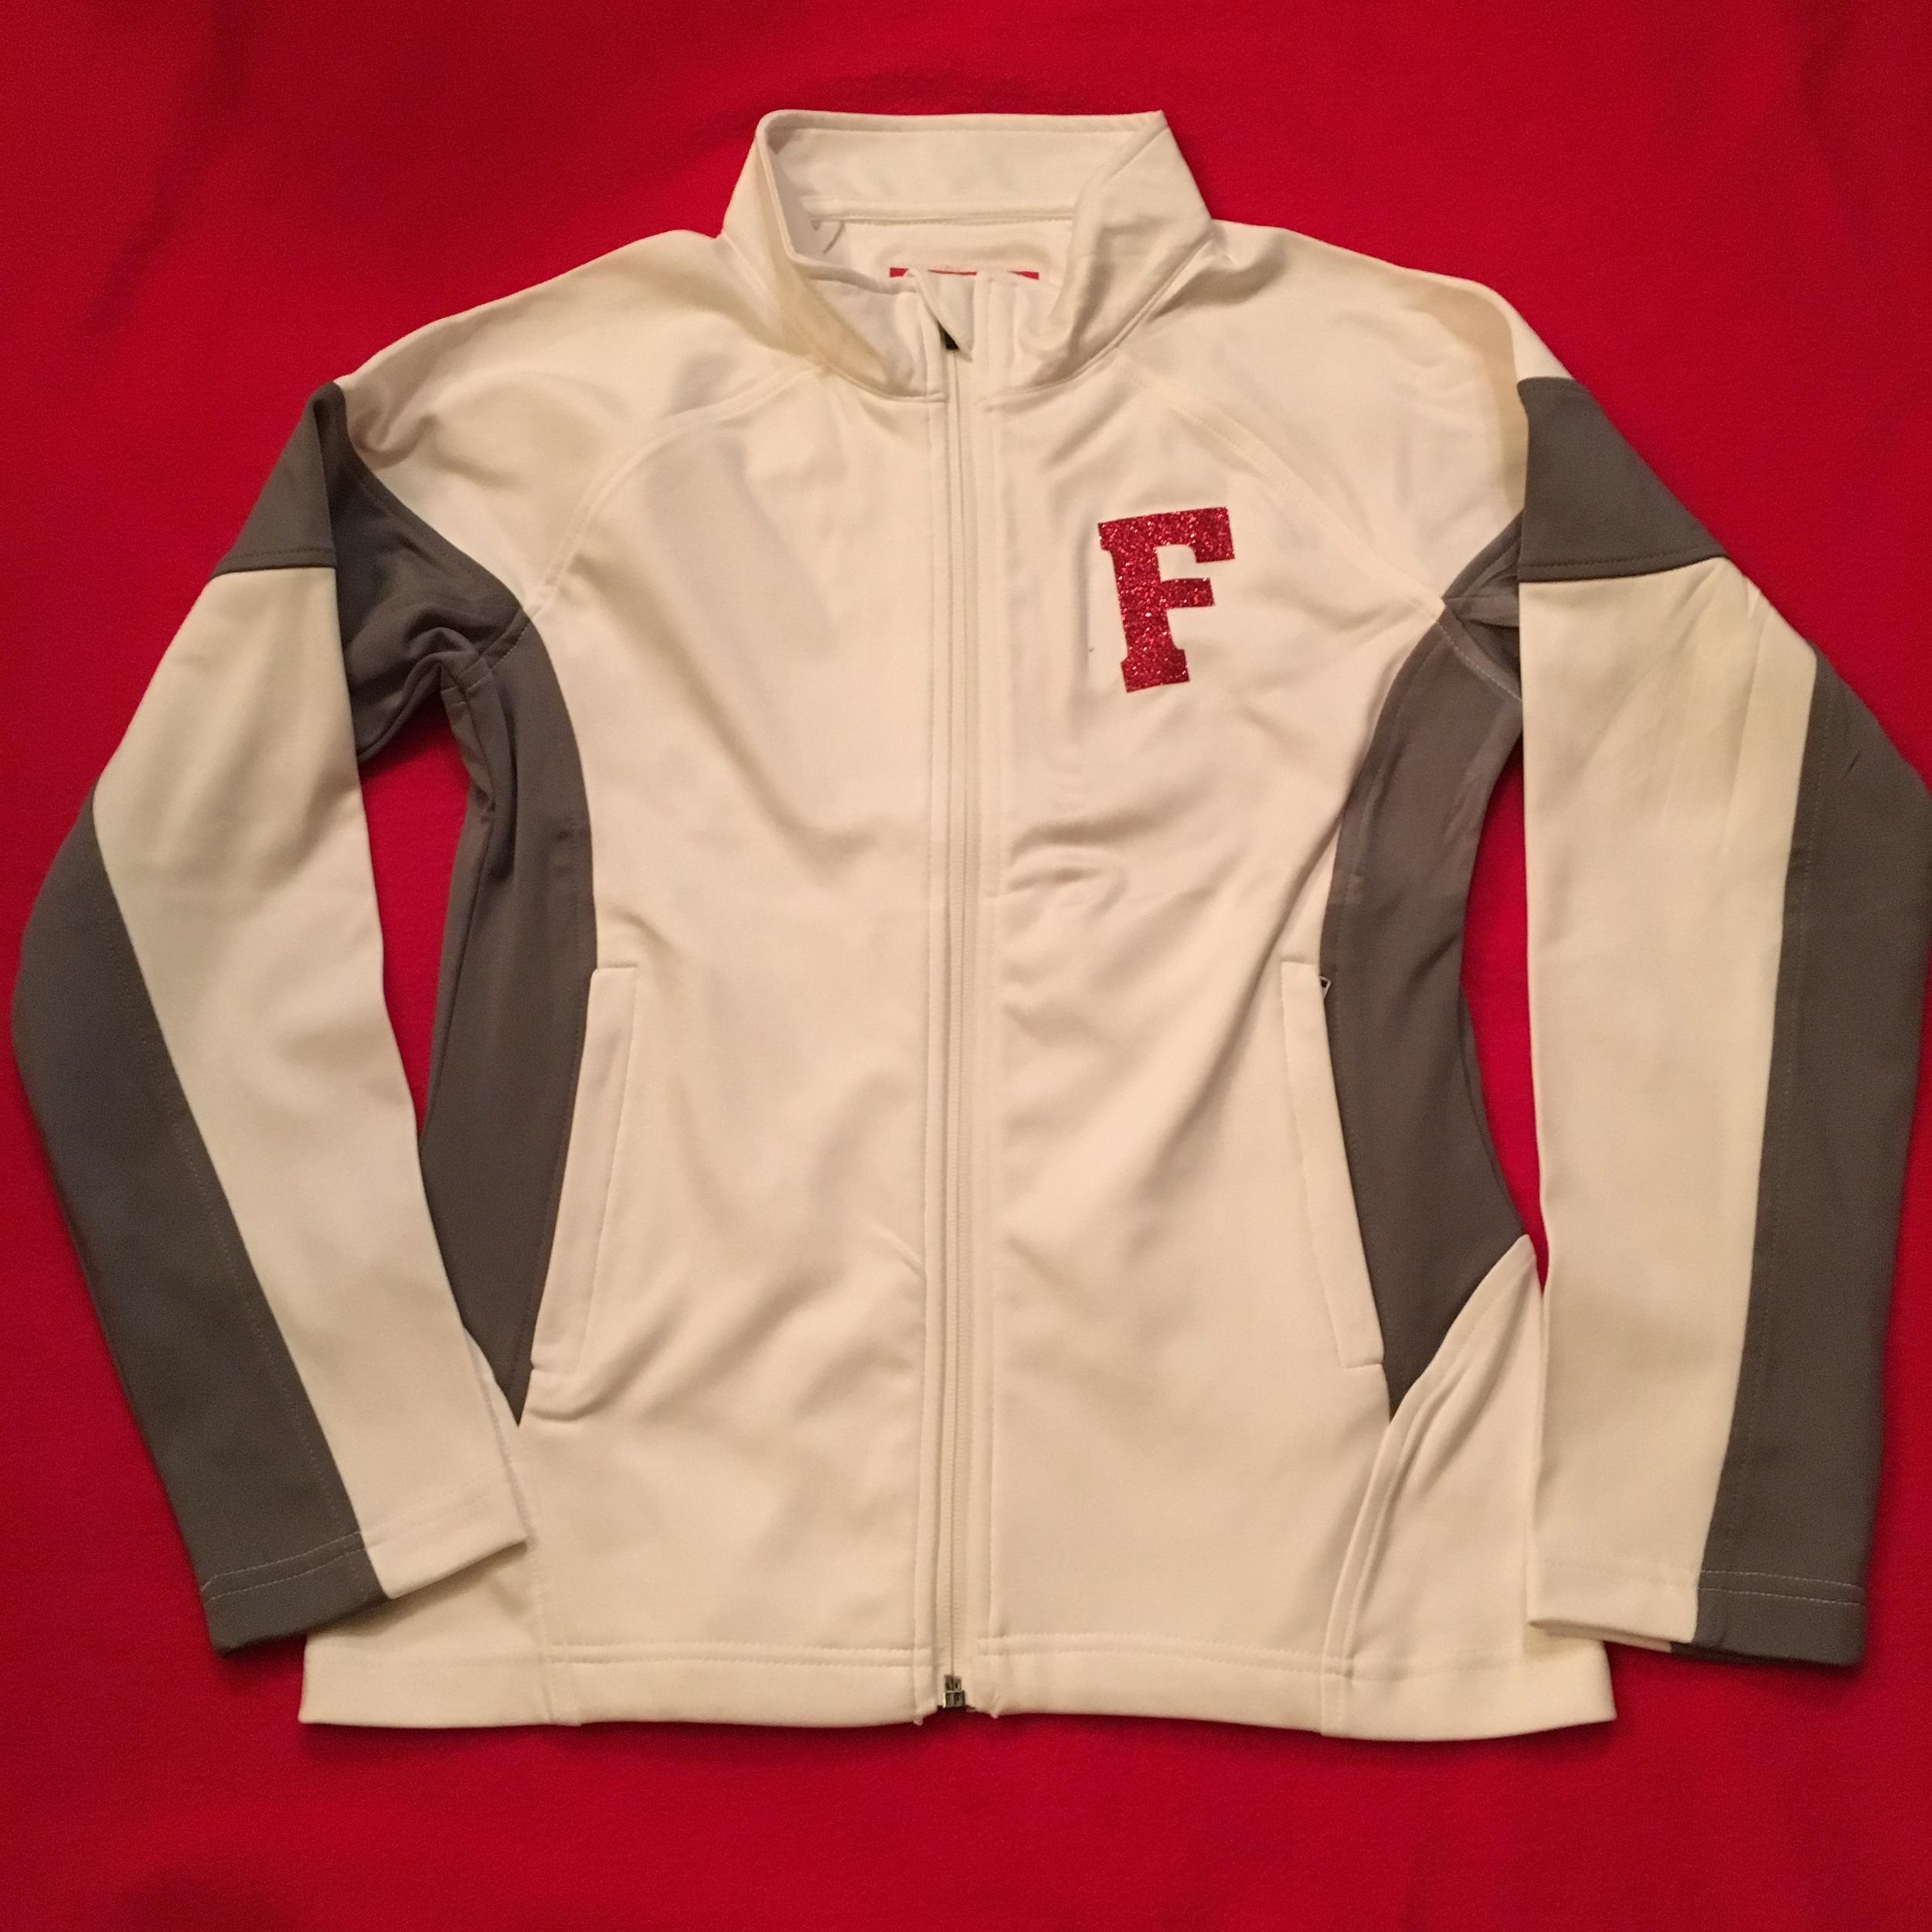 SW Ladies white/grey full zip jacket w glitter logo front